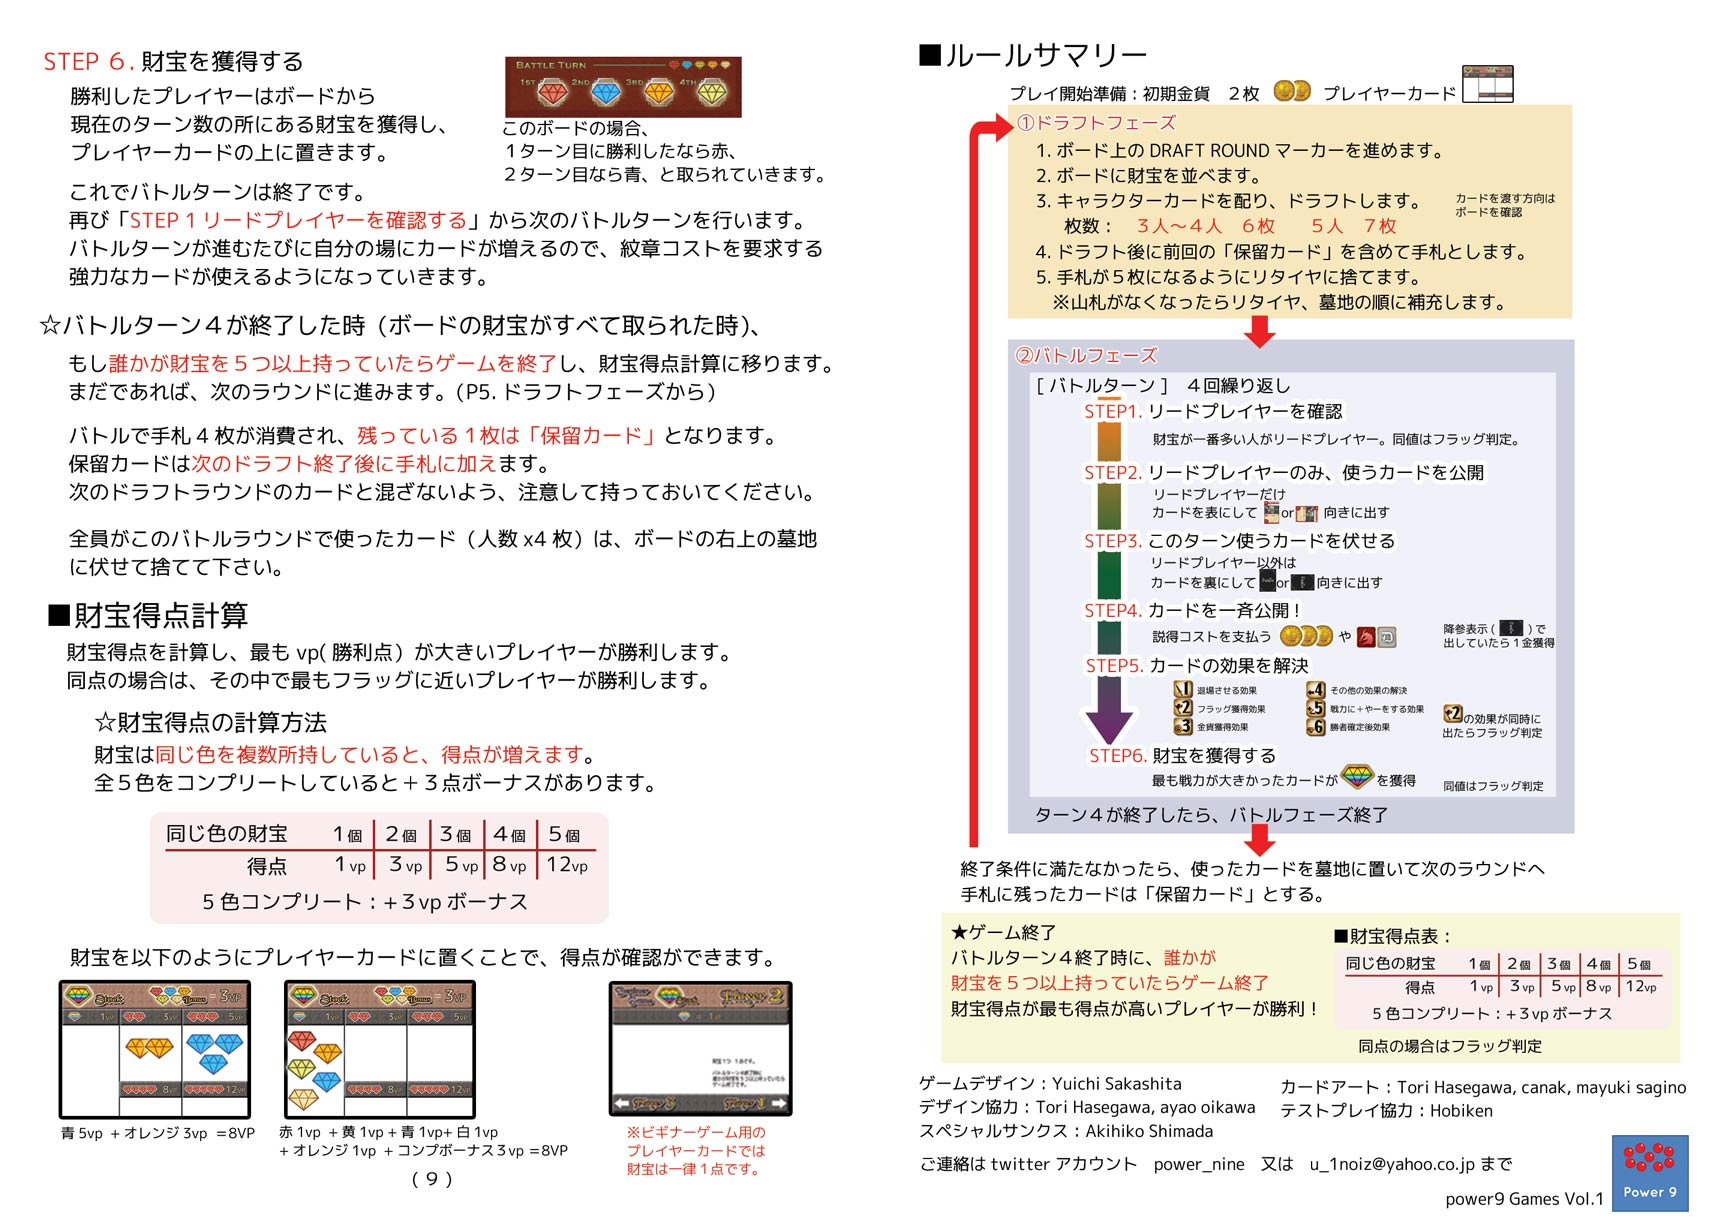 201210252351345e3.jpg